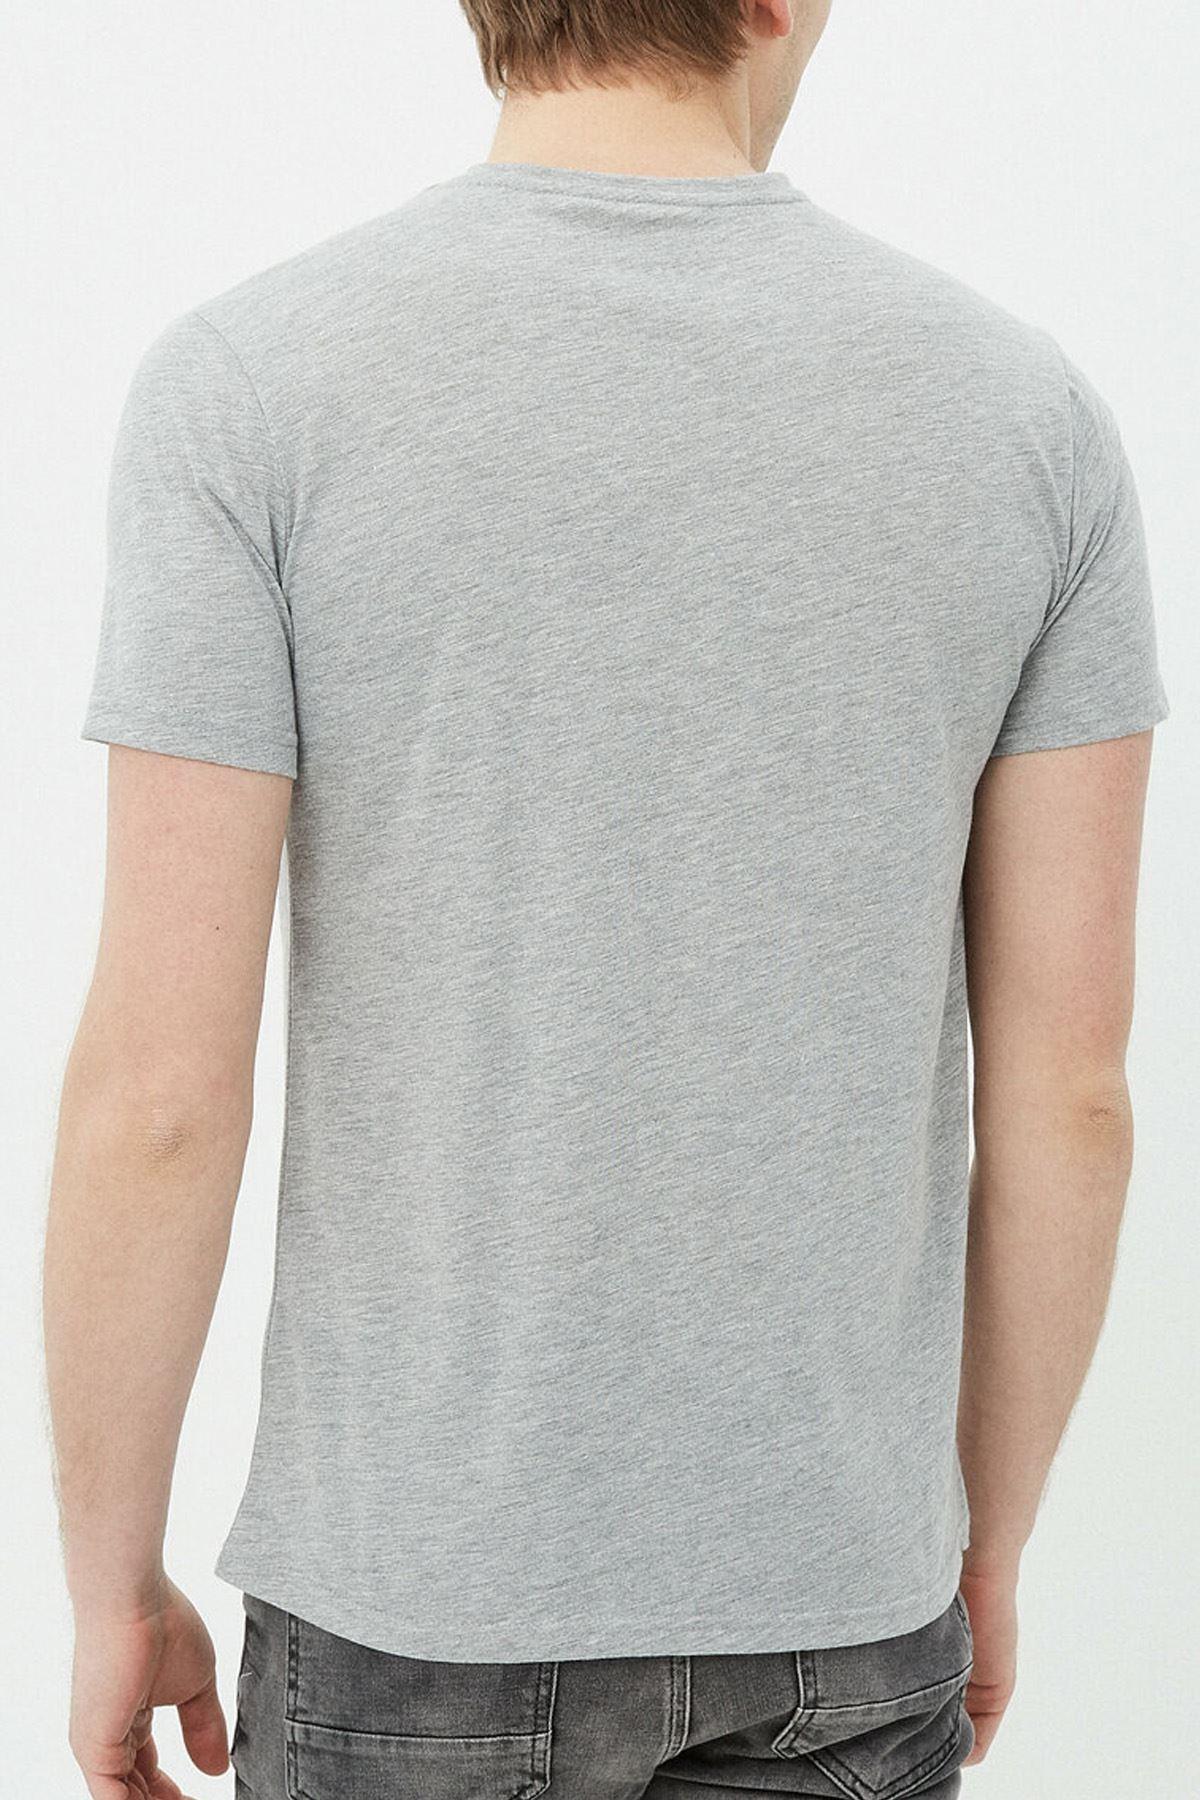 Anime Bebop 02 Gri Erkek Tshirt - Tişört